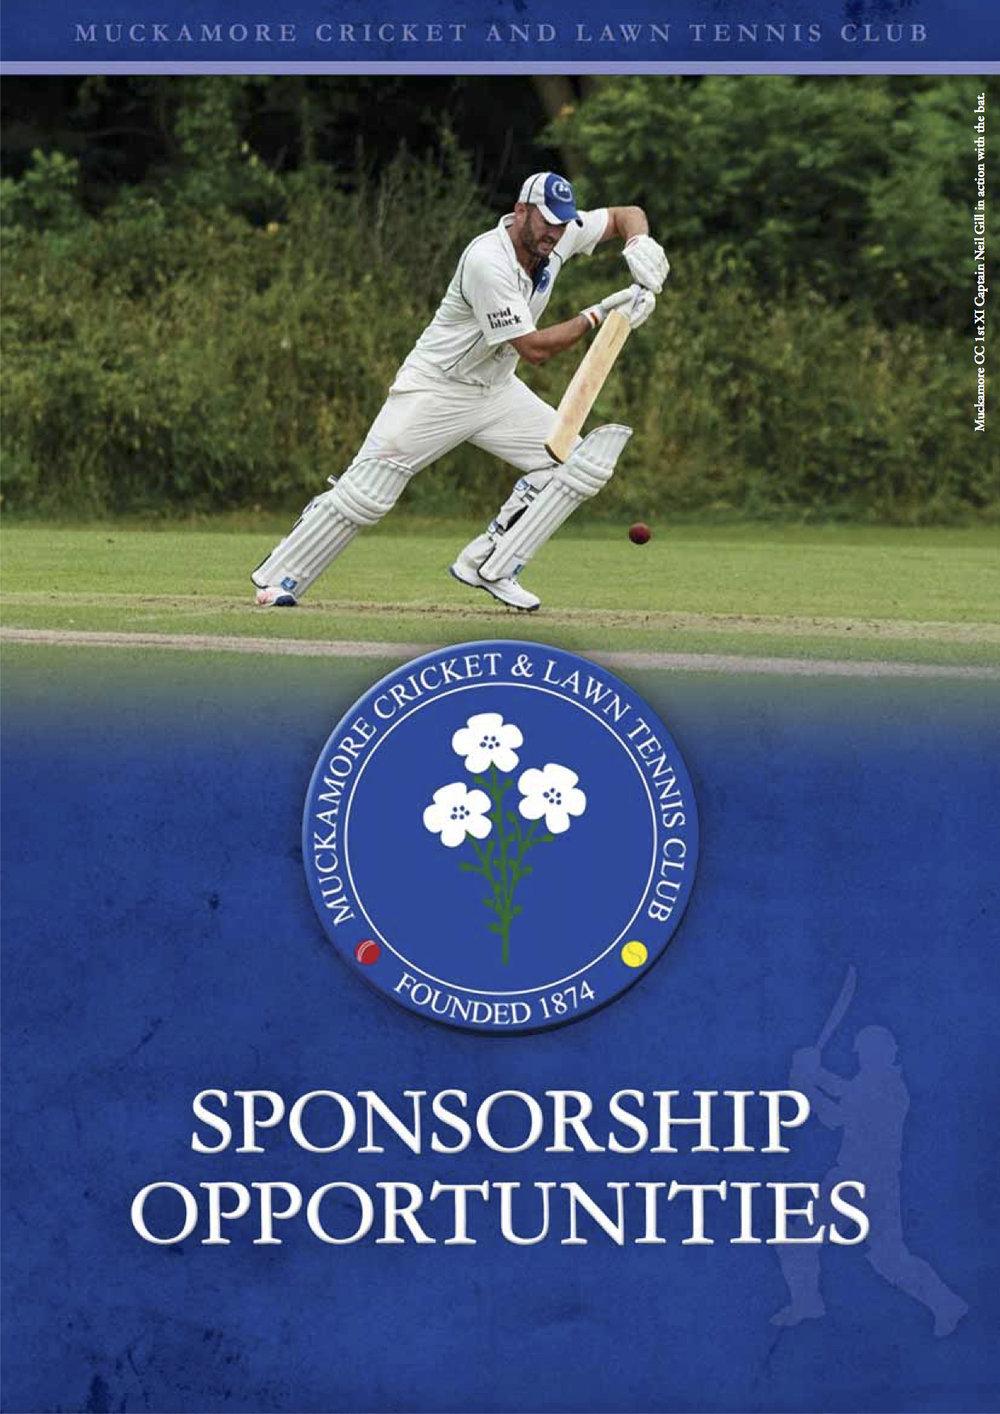 mcltc sponsorship opportunities.jpg